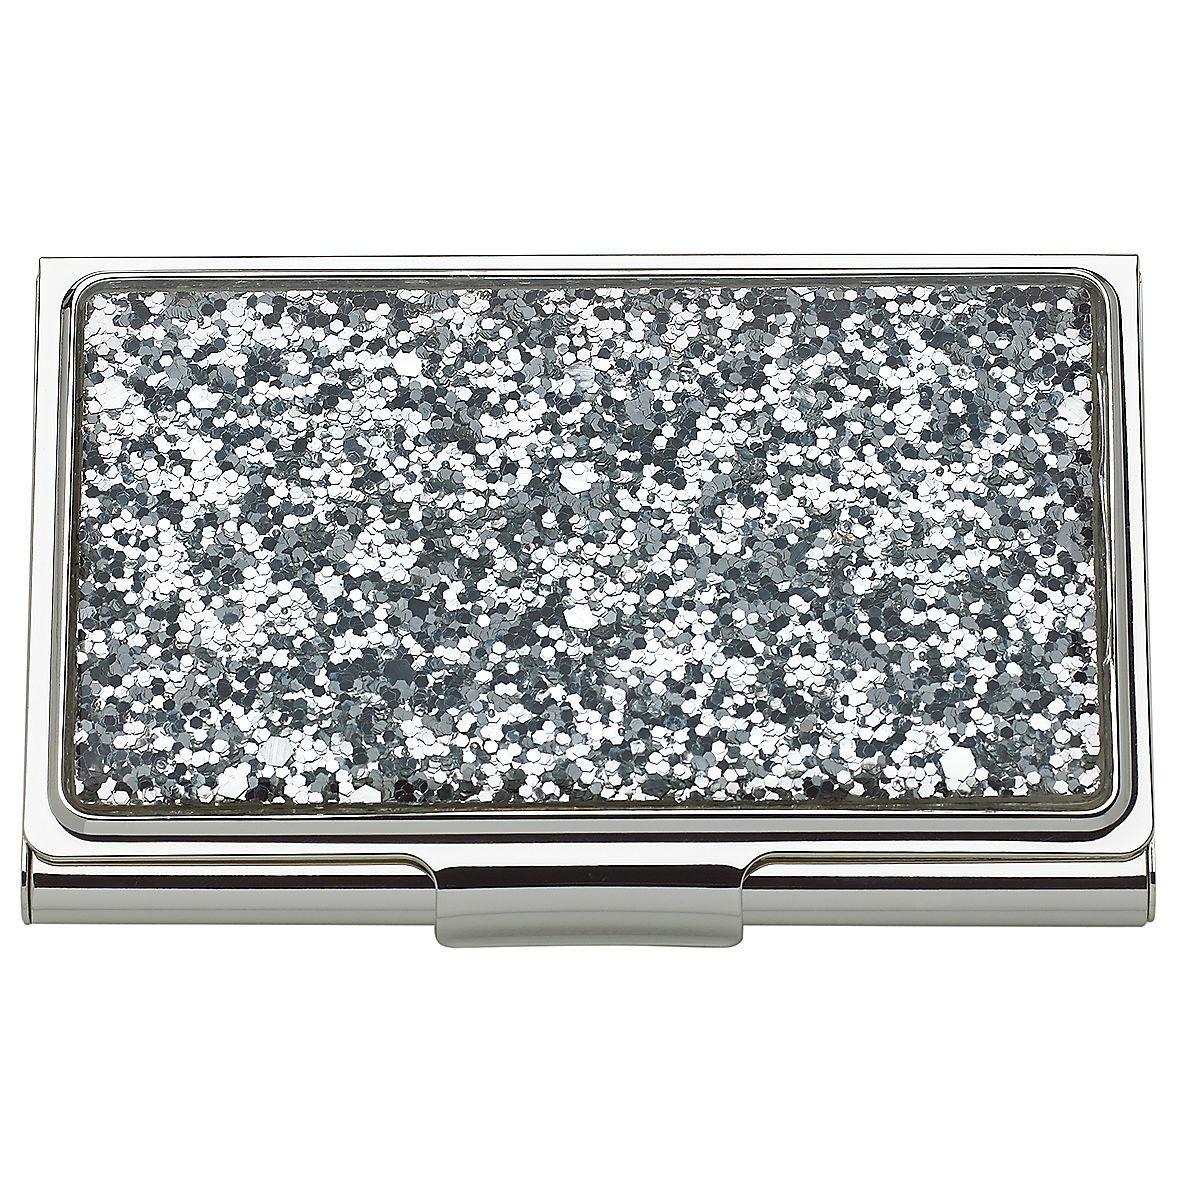 Kate Spade New York, Lenox Simply Sparkling Silver Glitter Business Card Holder